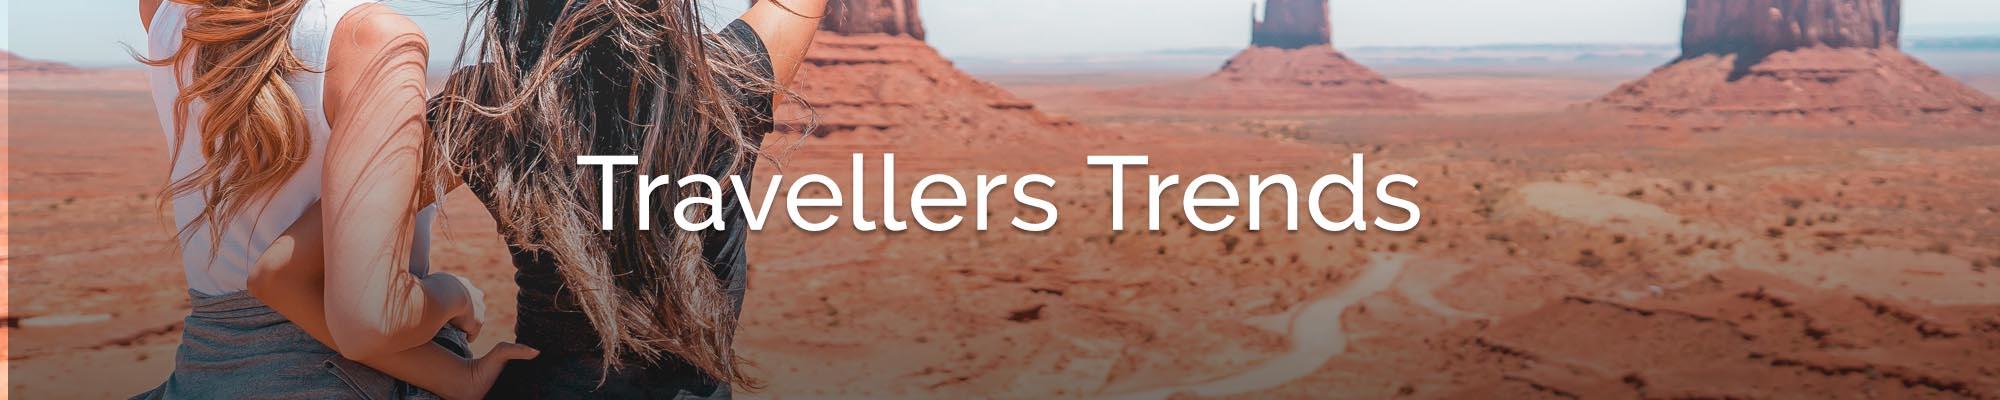 traveller trends